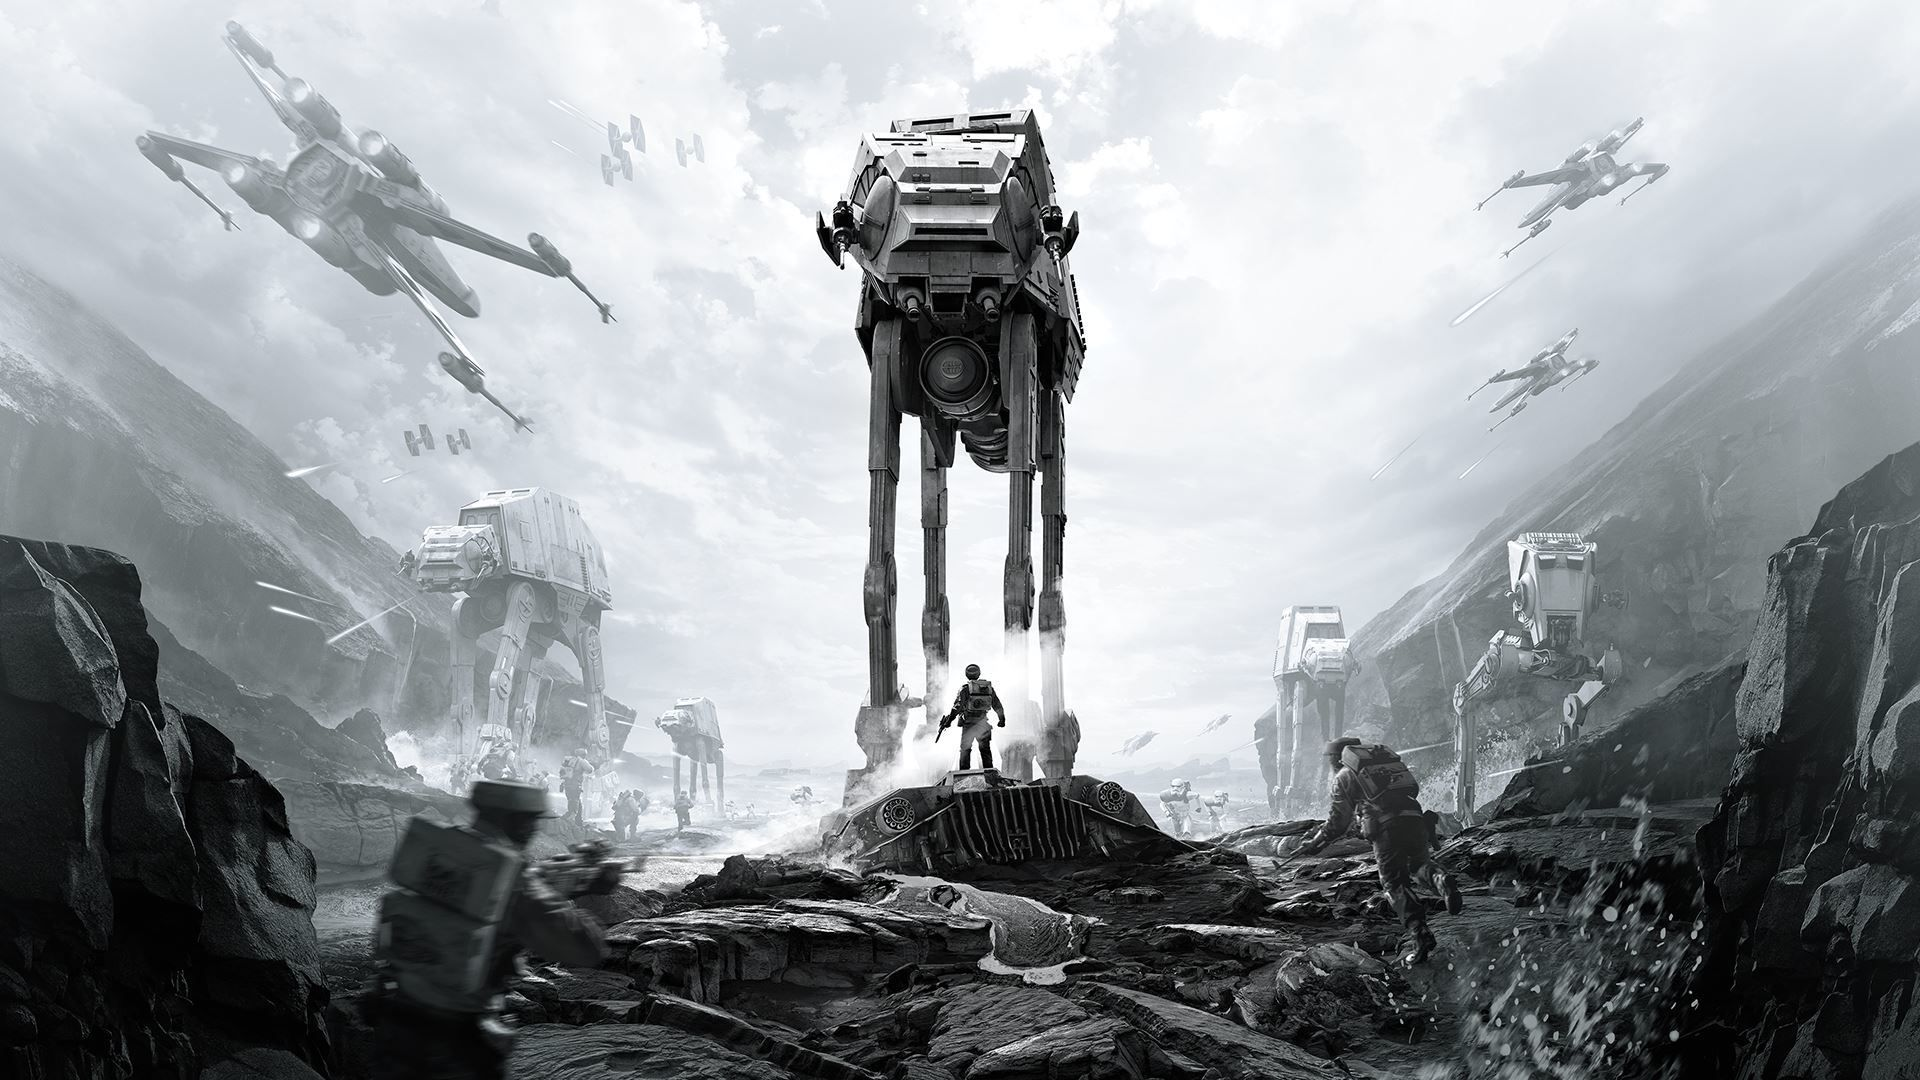 Star Wars Battlefront New Hd Wallpaper Star Wars Wallpaper Star